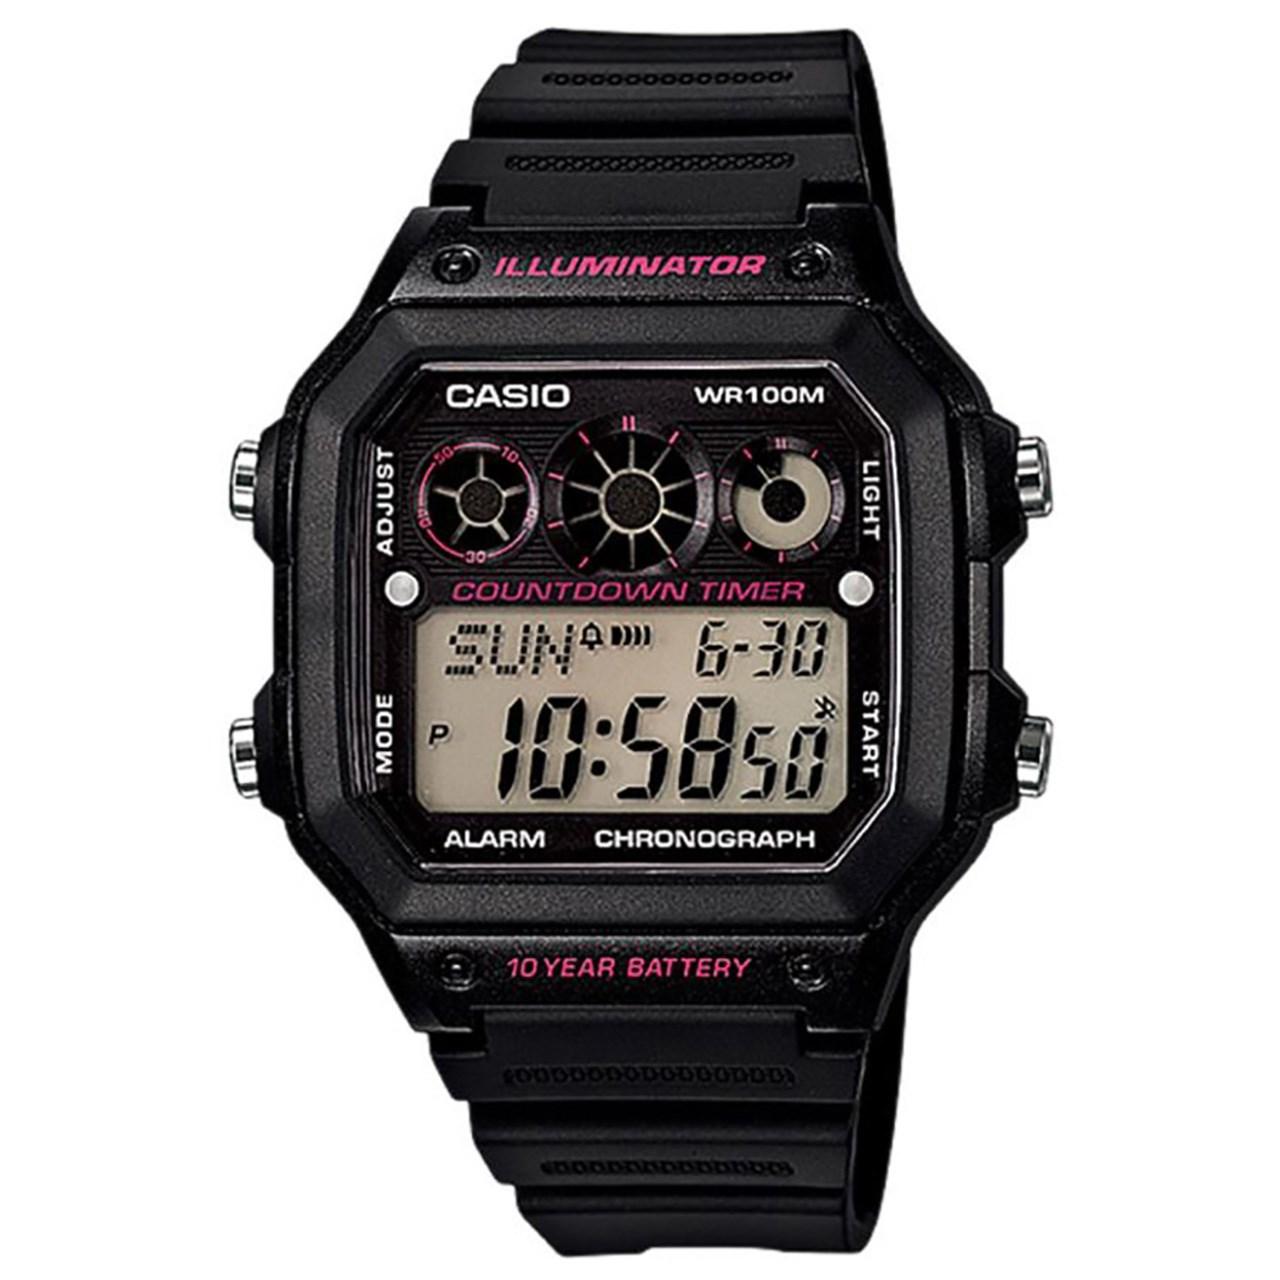 ساعت مچی دیجیتال کاسیو مدل AE-1300WH-1A2VDF              اصل